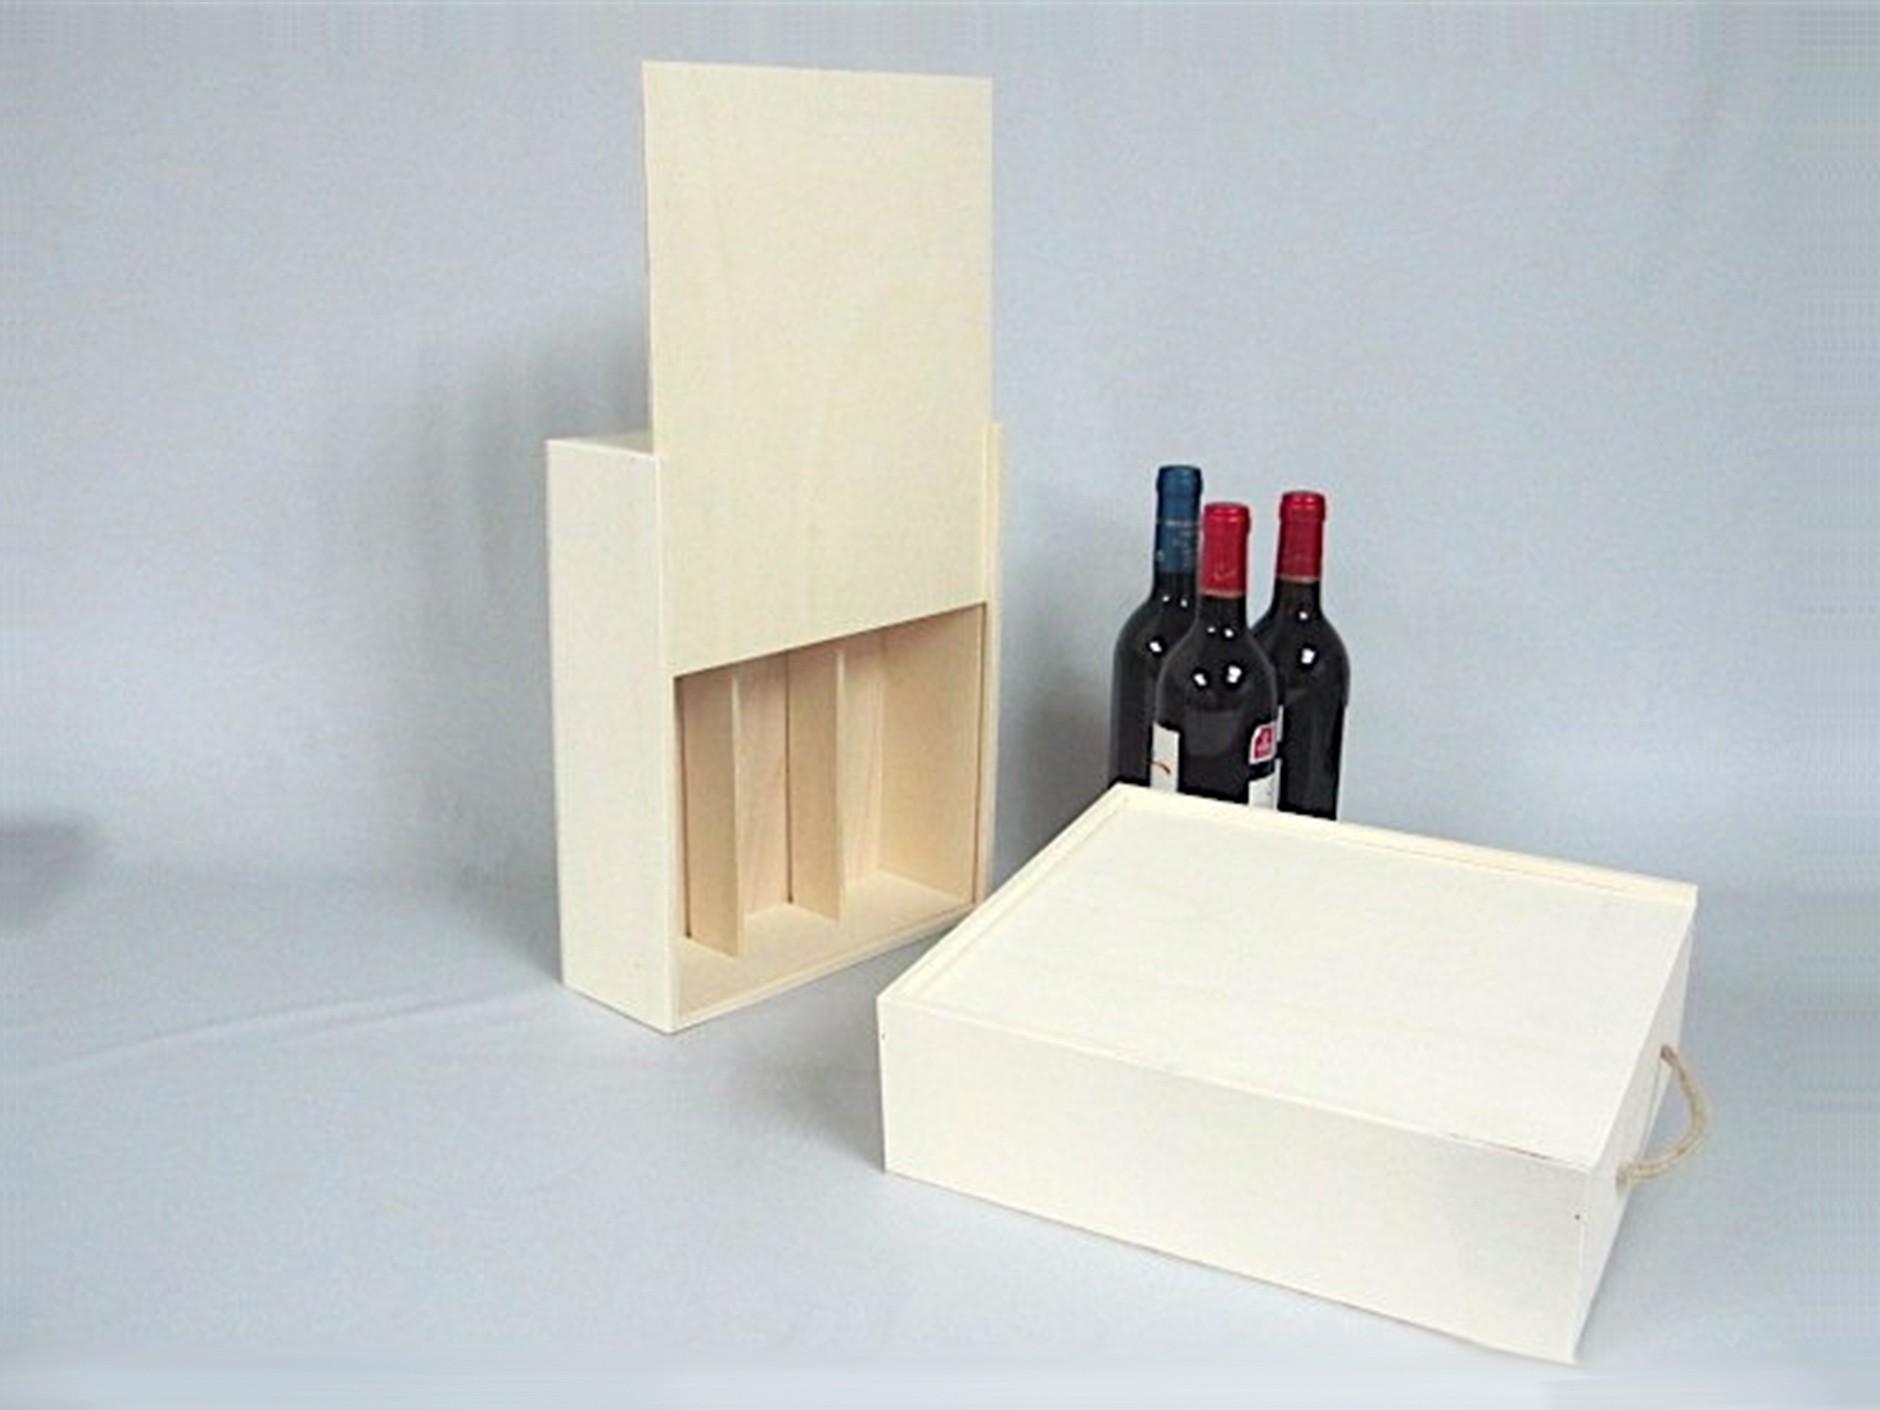 Caja 3 Botellas de vino Tapa Corredera Ref.3botTC